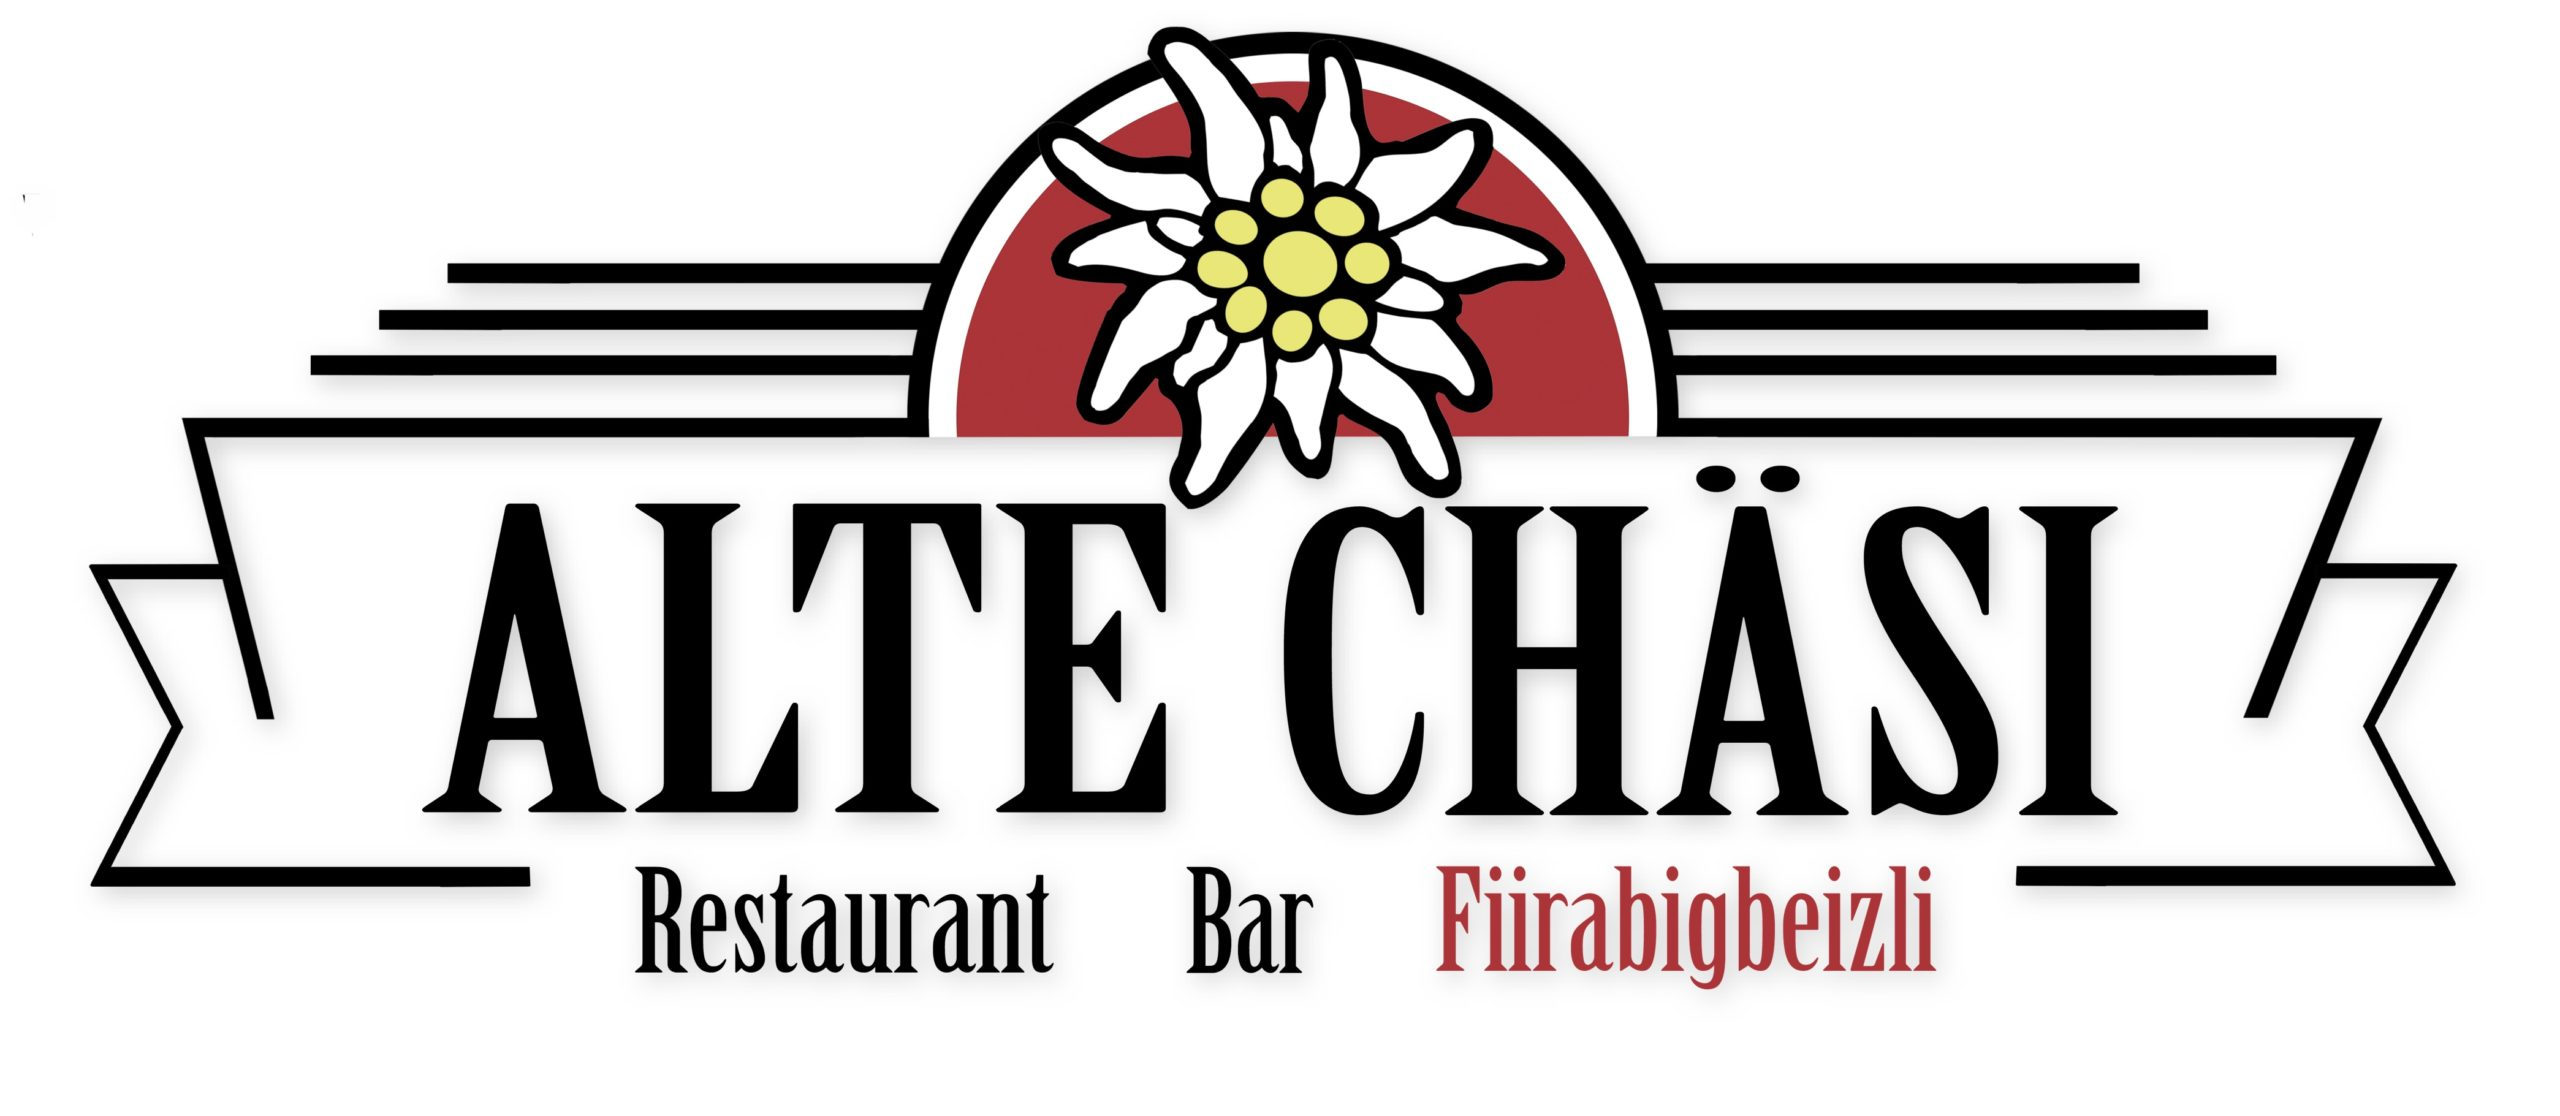 Restaurant ALTE CHÄSI Fiirabigbeizli